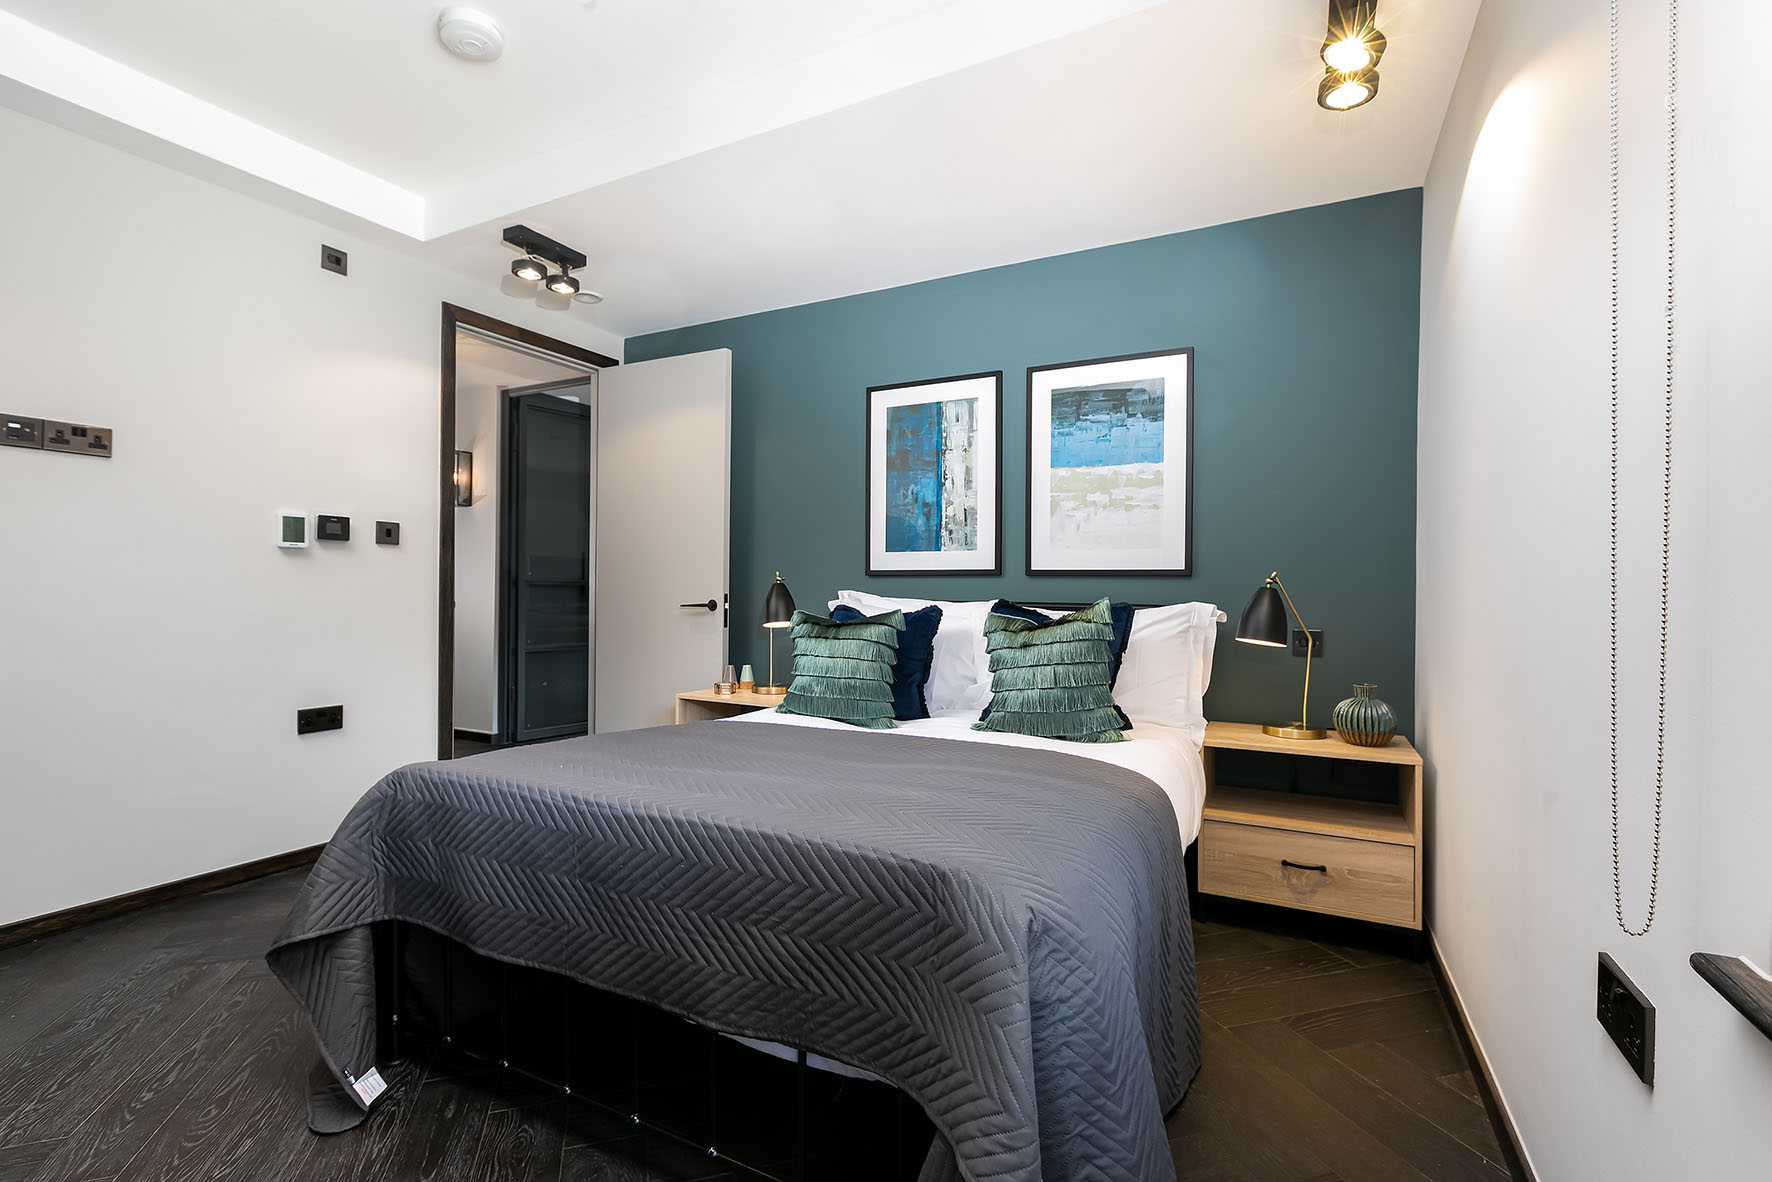 Lovelydays luxury service apartment rental - London - Soho - Noel Street VI - Lovelysuite - 2 bedrooms - 2 bathrooms - Queen bed - ea98079c9fad - Lovelydays